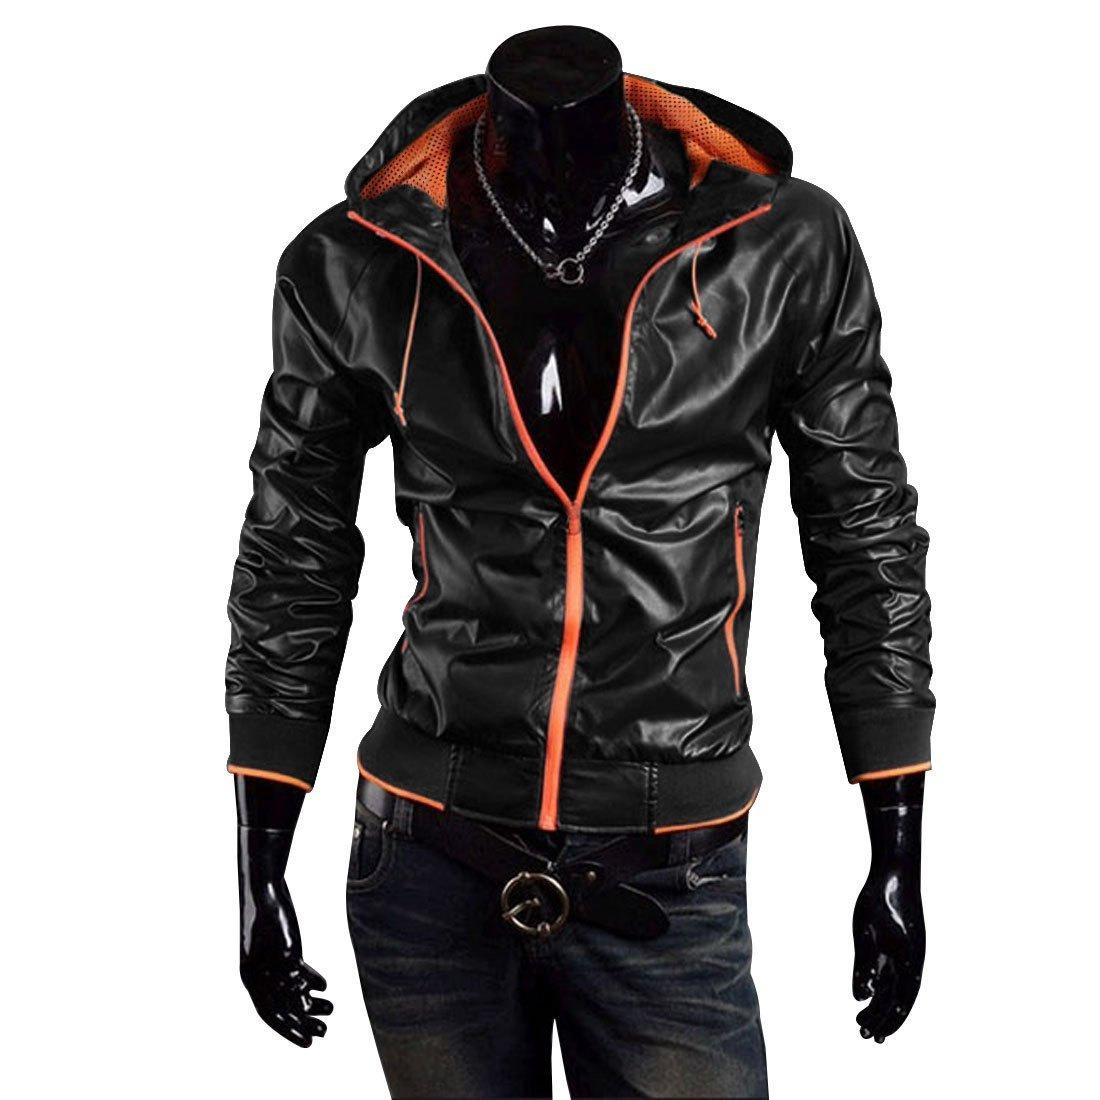 Handmade leather jacket